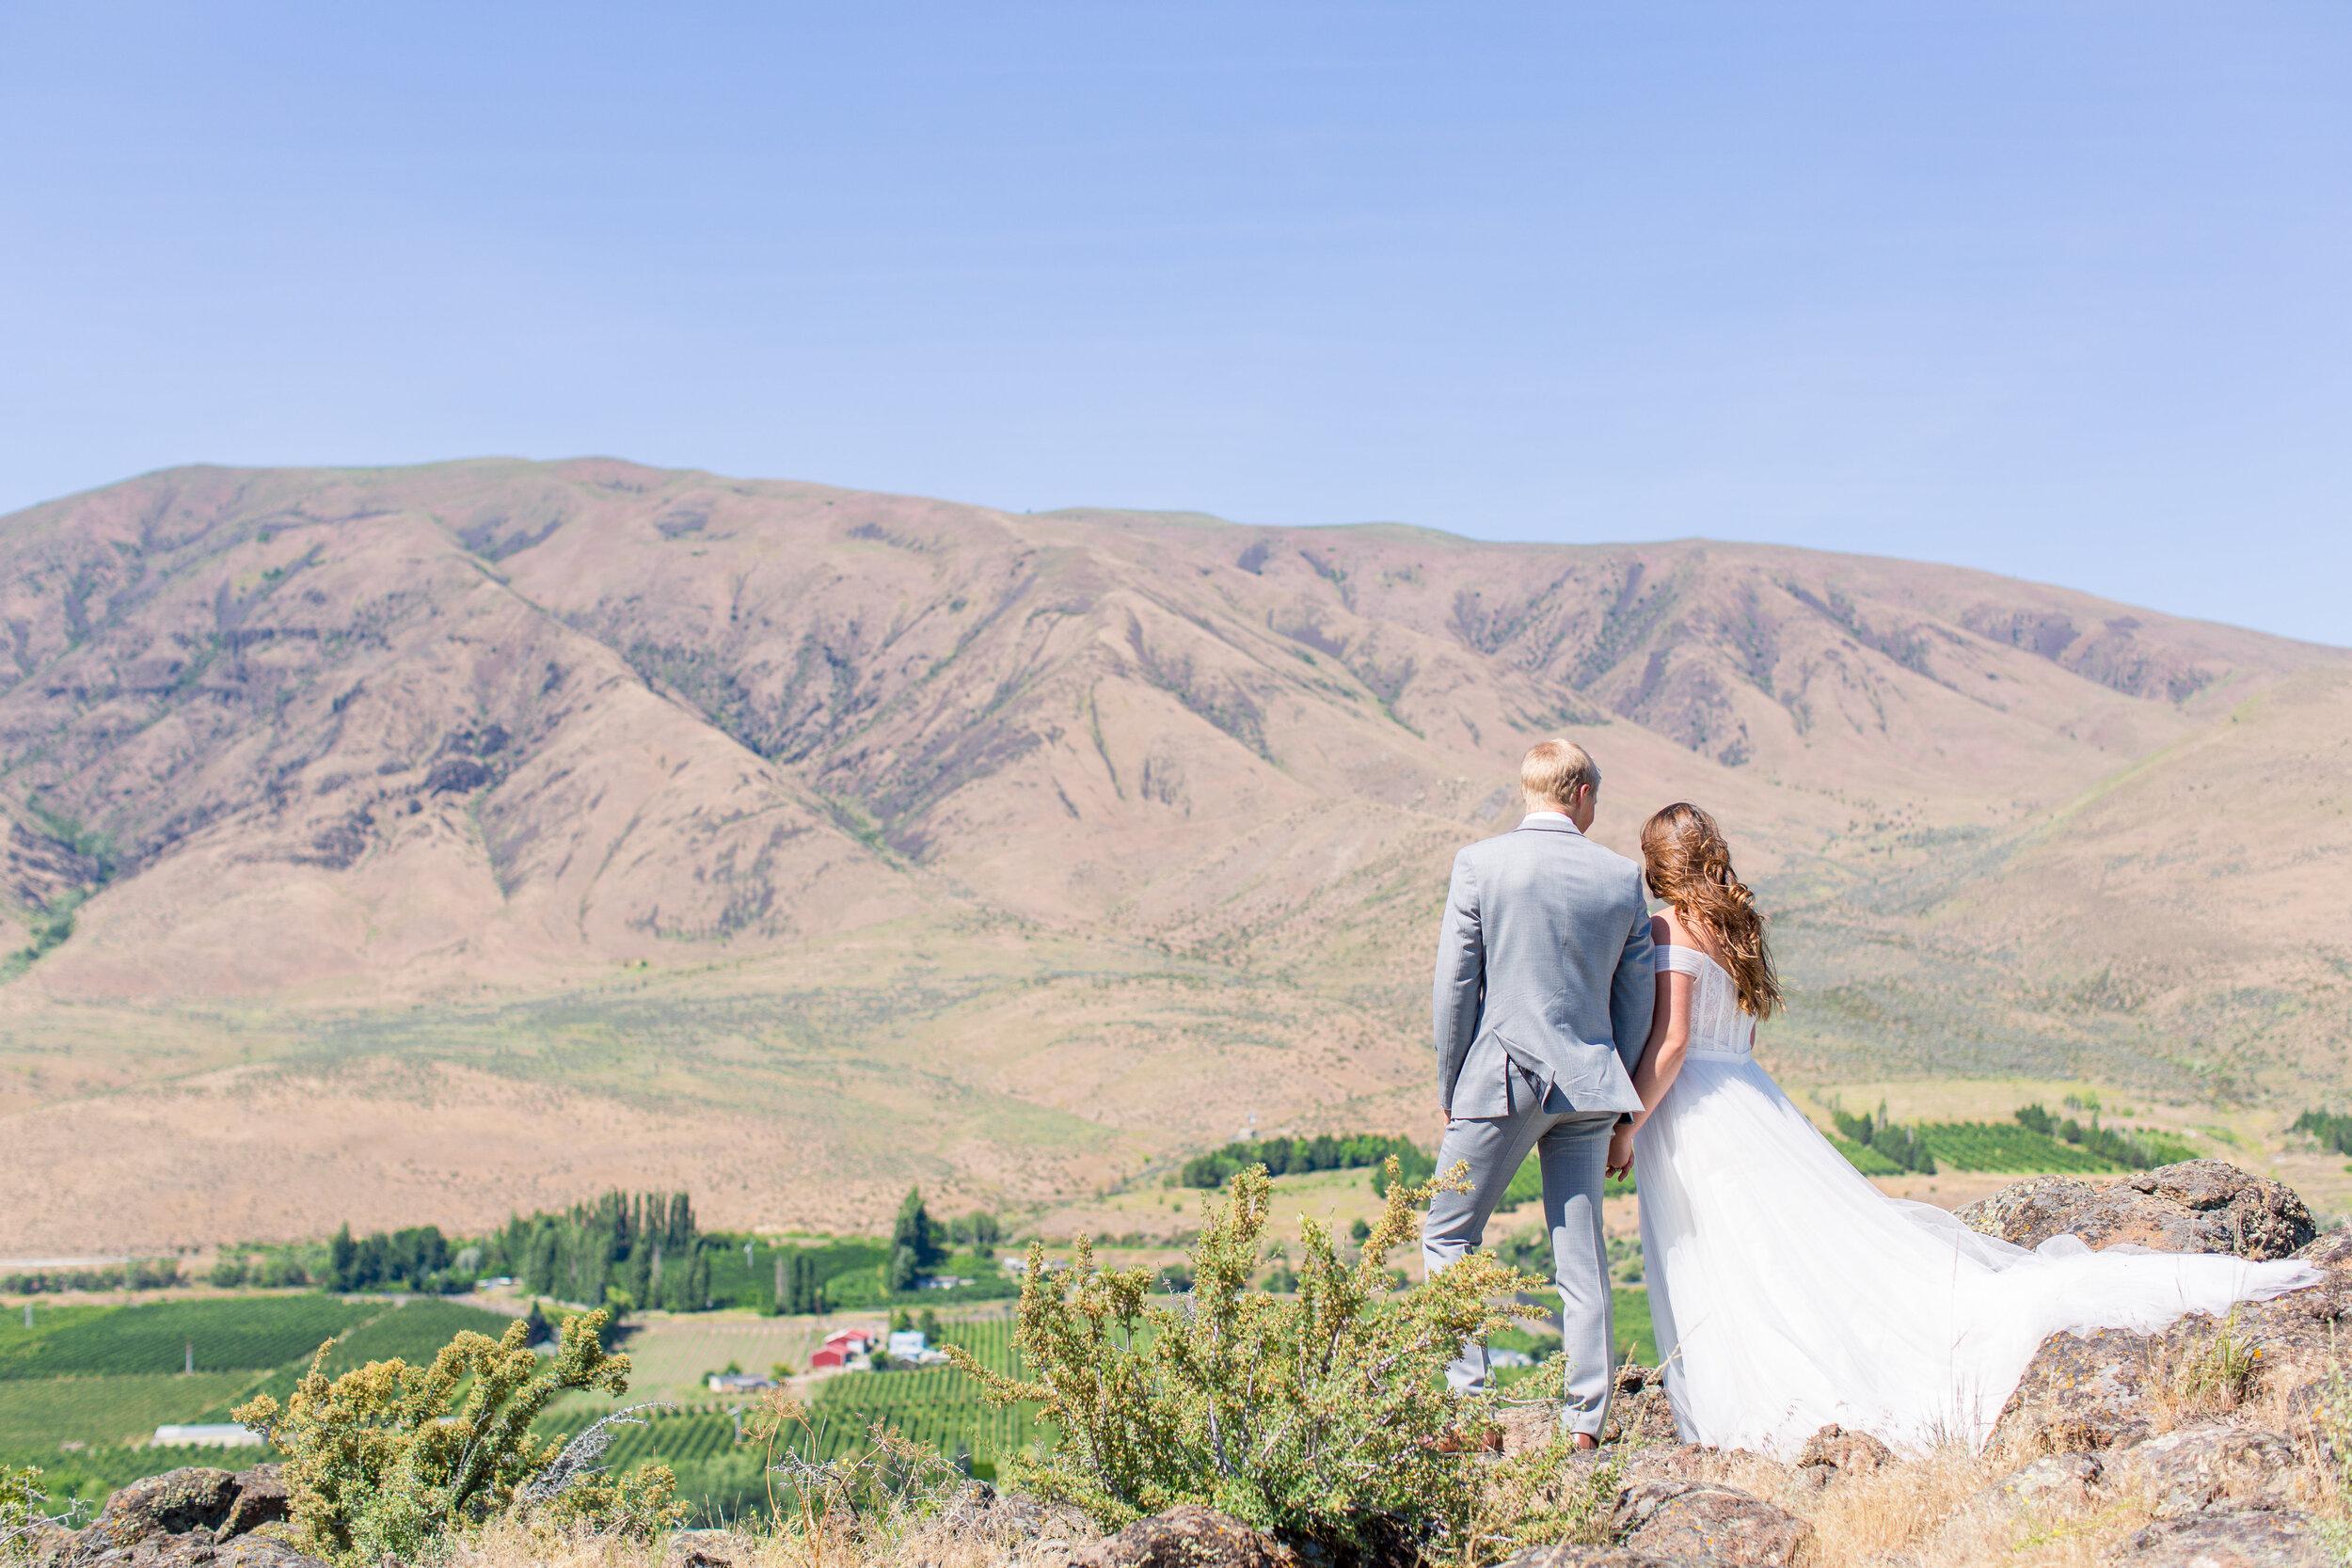 bride and groom on a hill spokane